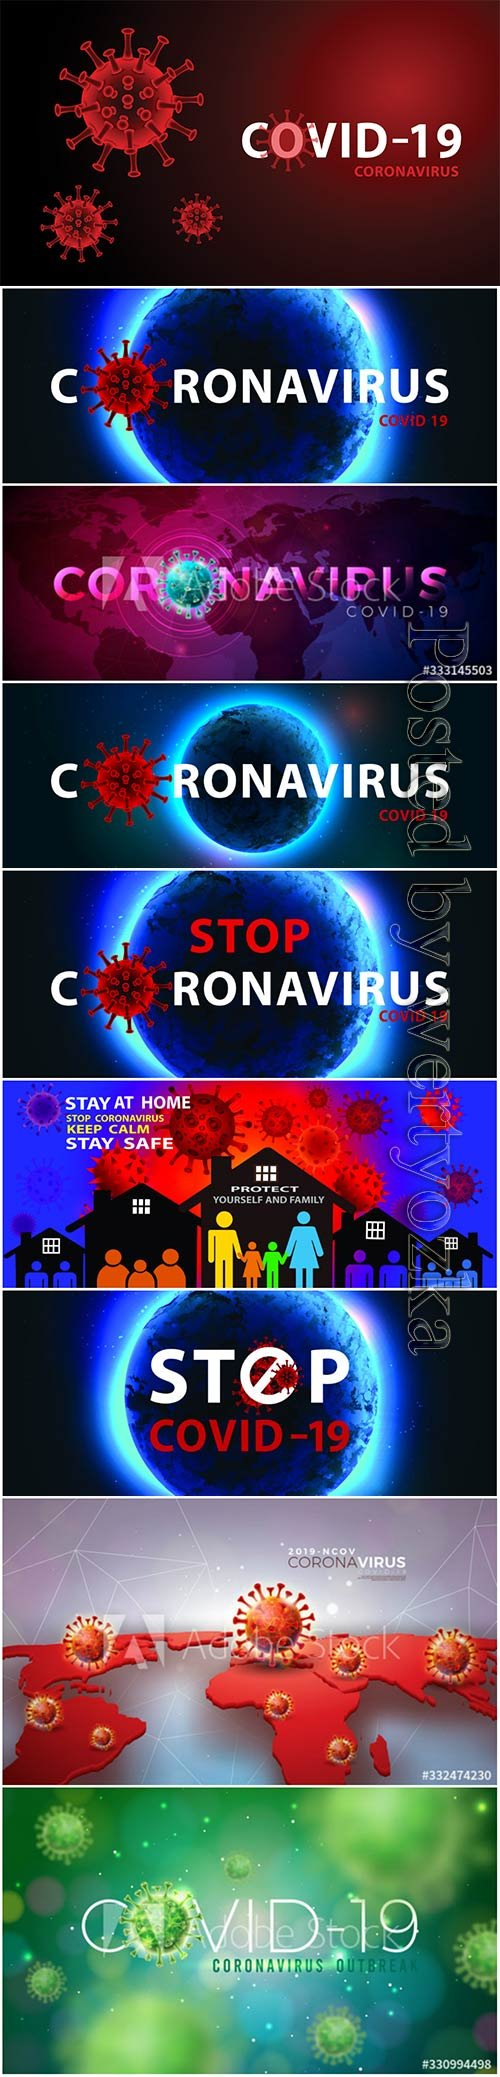 COVID 19, Coranavirus vector illustration sets # 28